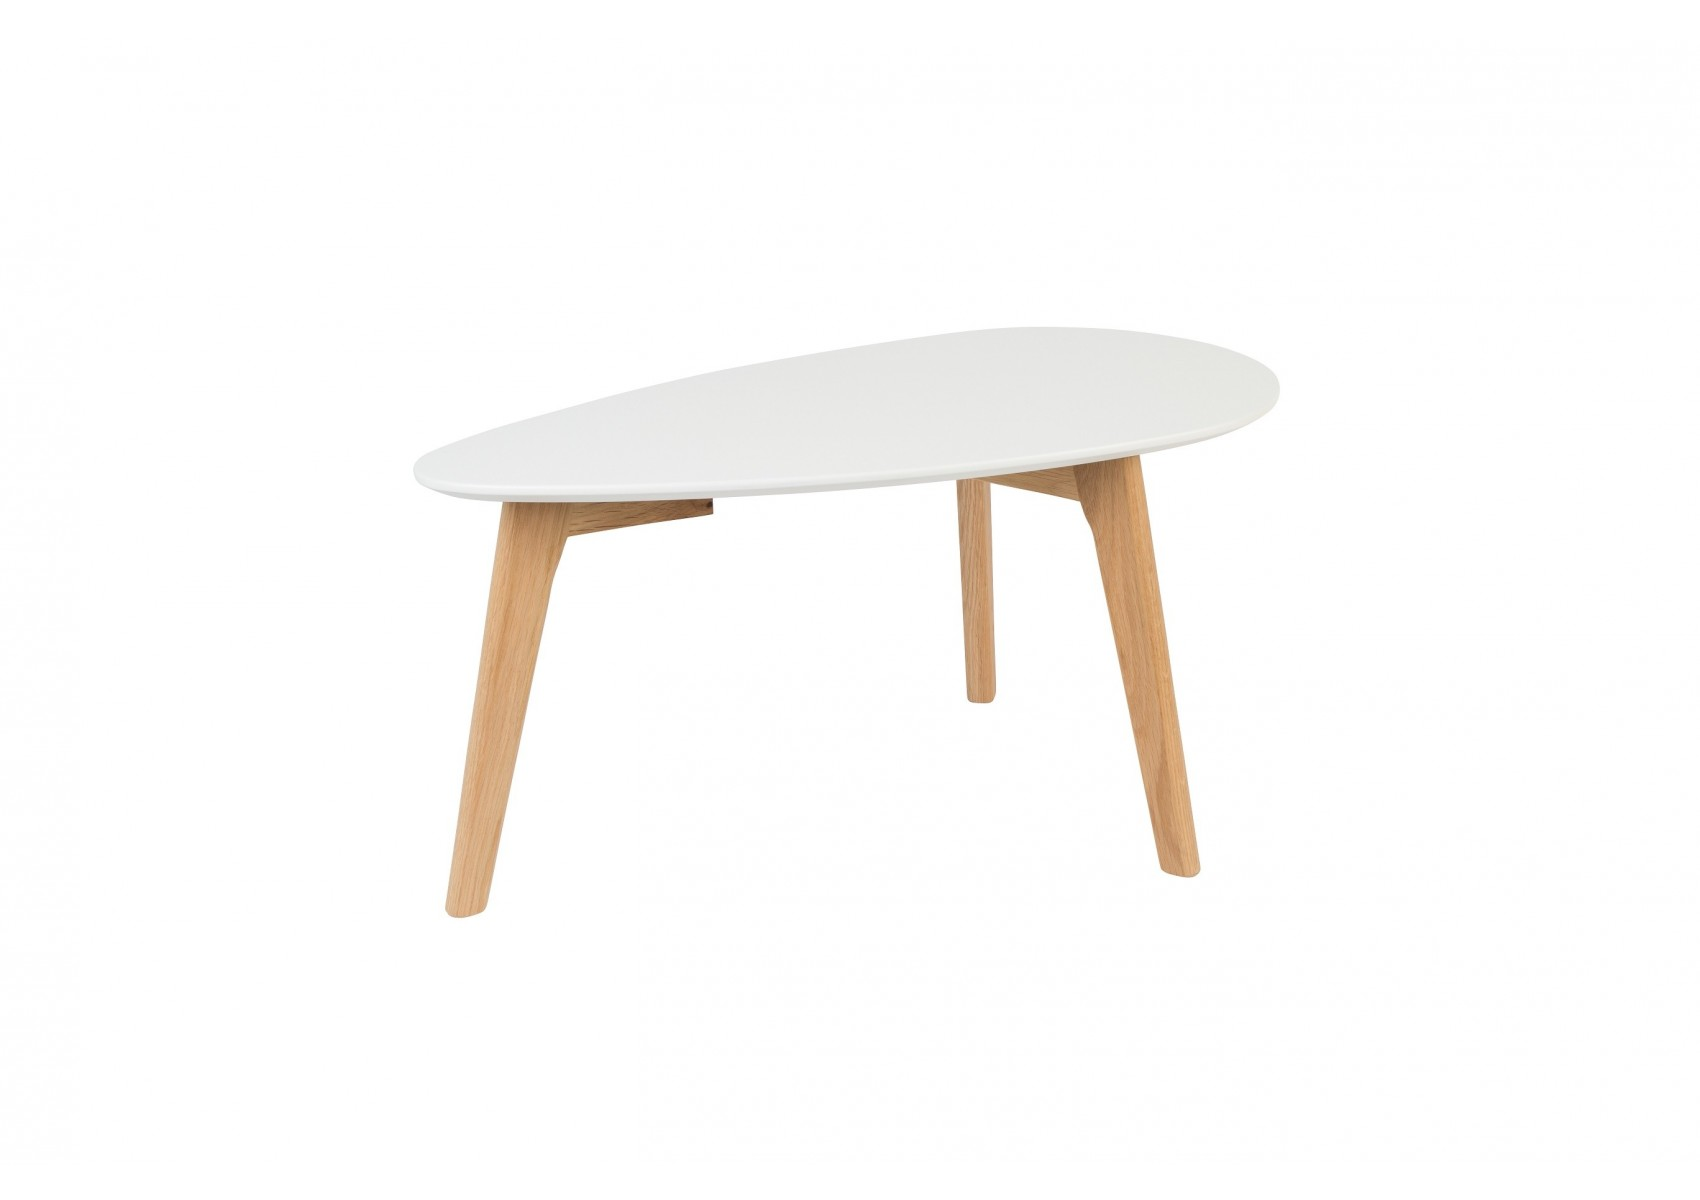 tables basse scandinave Drop laquée blanche